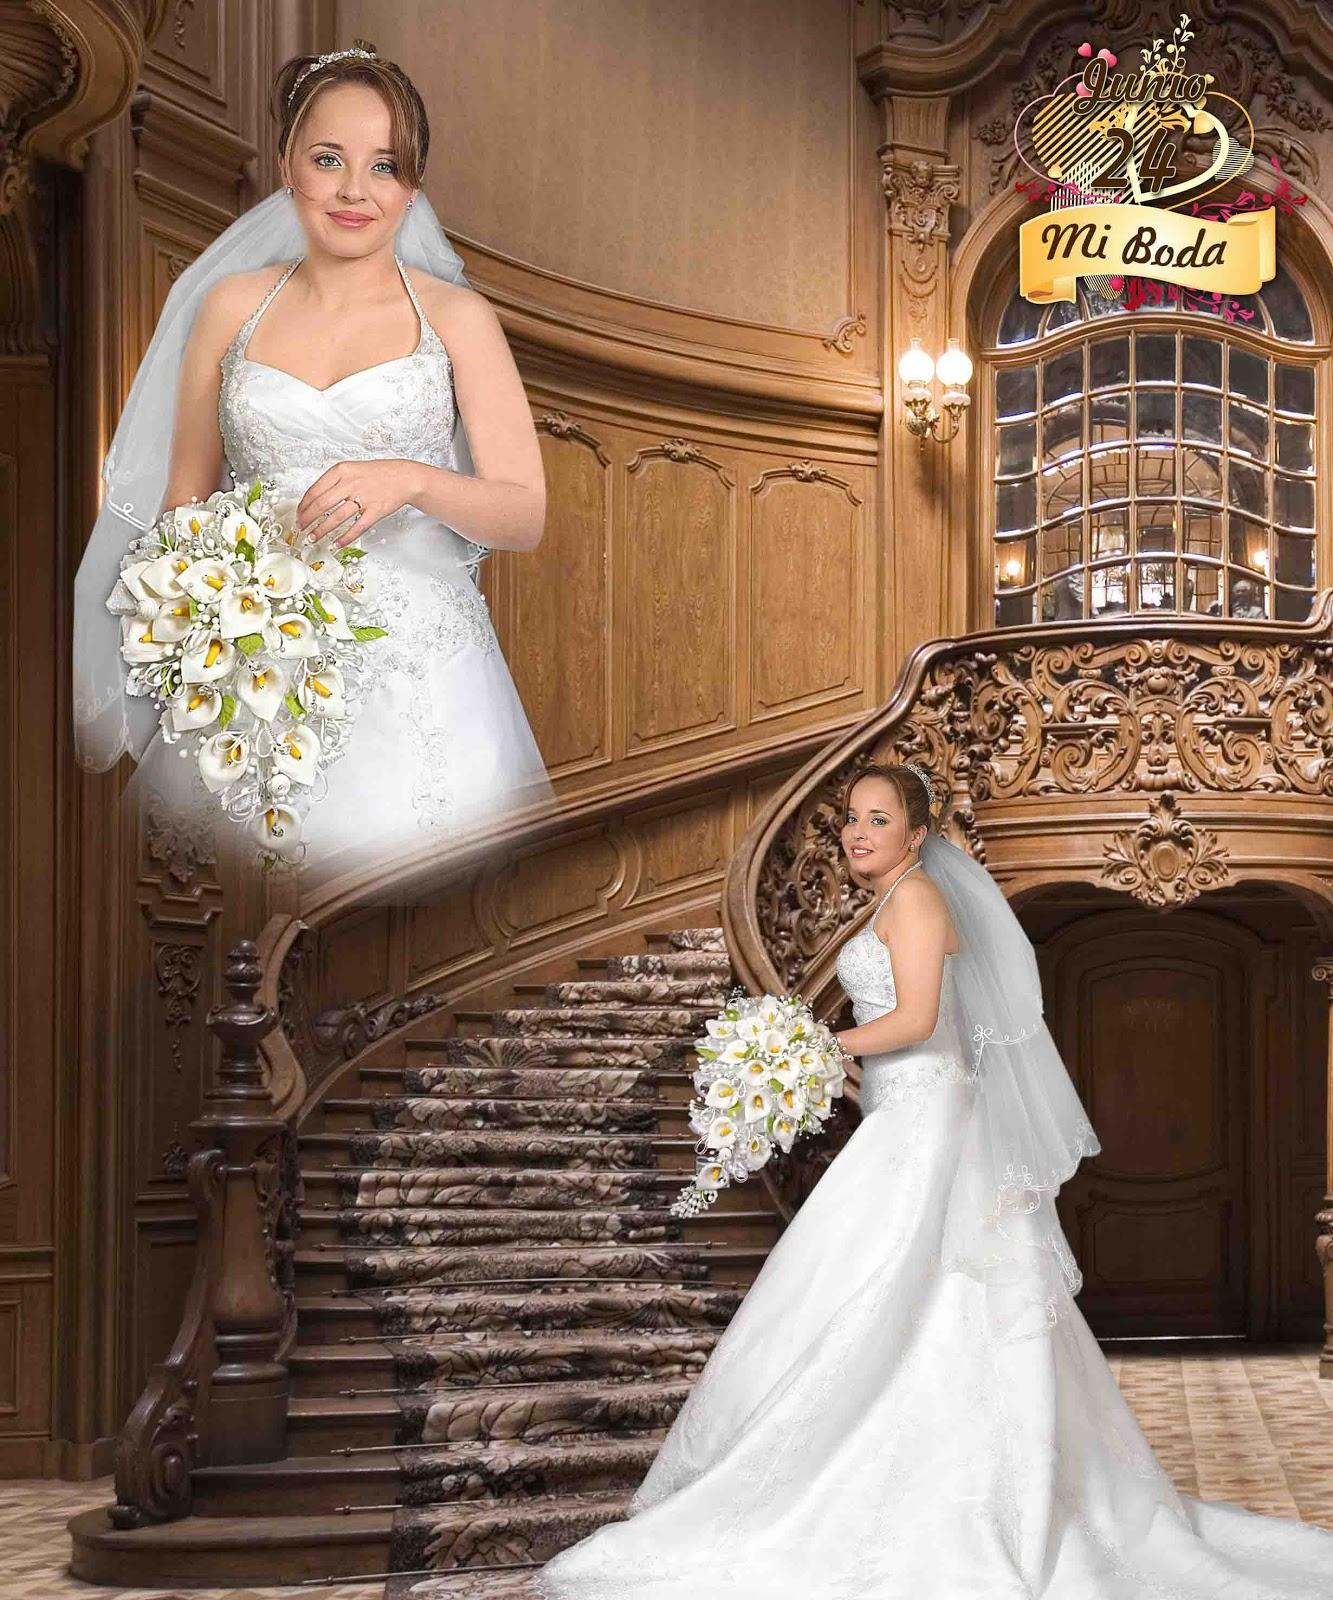 plantillas para boda photoshop gratis